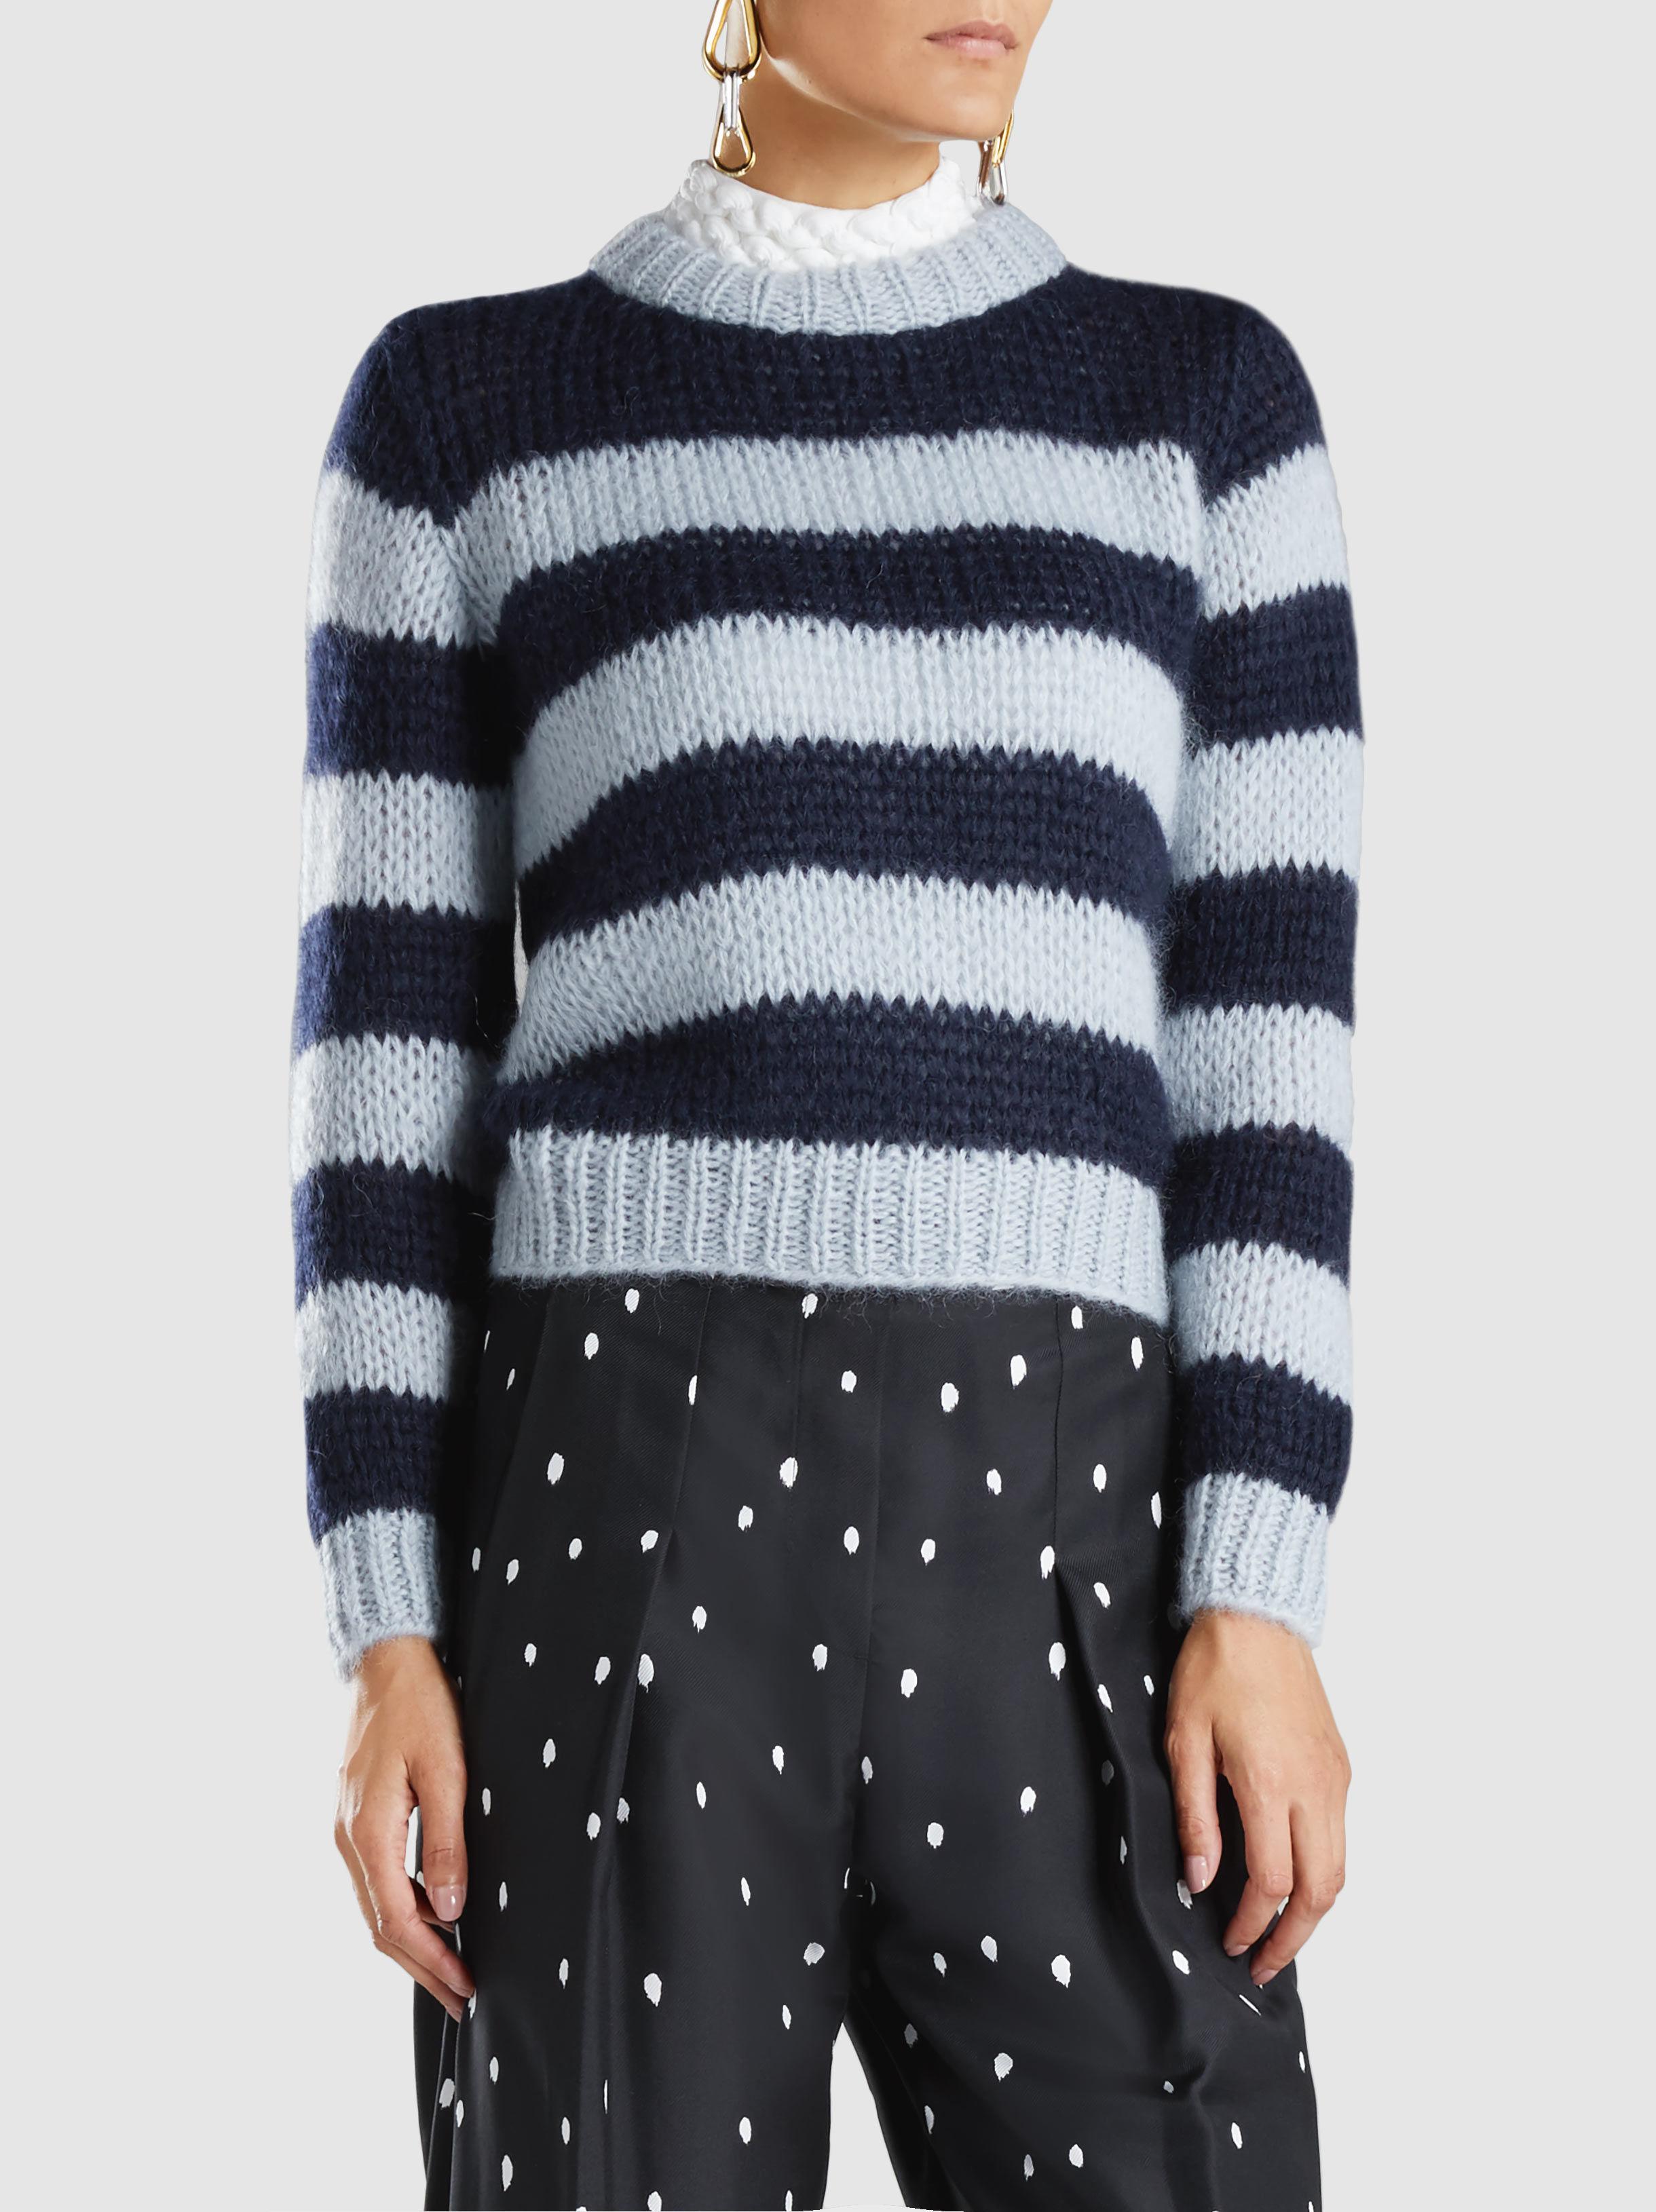 7707bfcfbd9b7 Lyst - Ganni Faucher Striped Mohair And Wool-blend Sweater in Blue